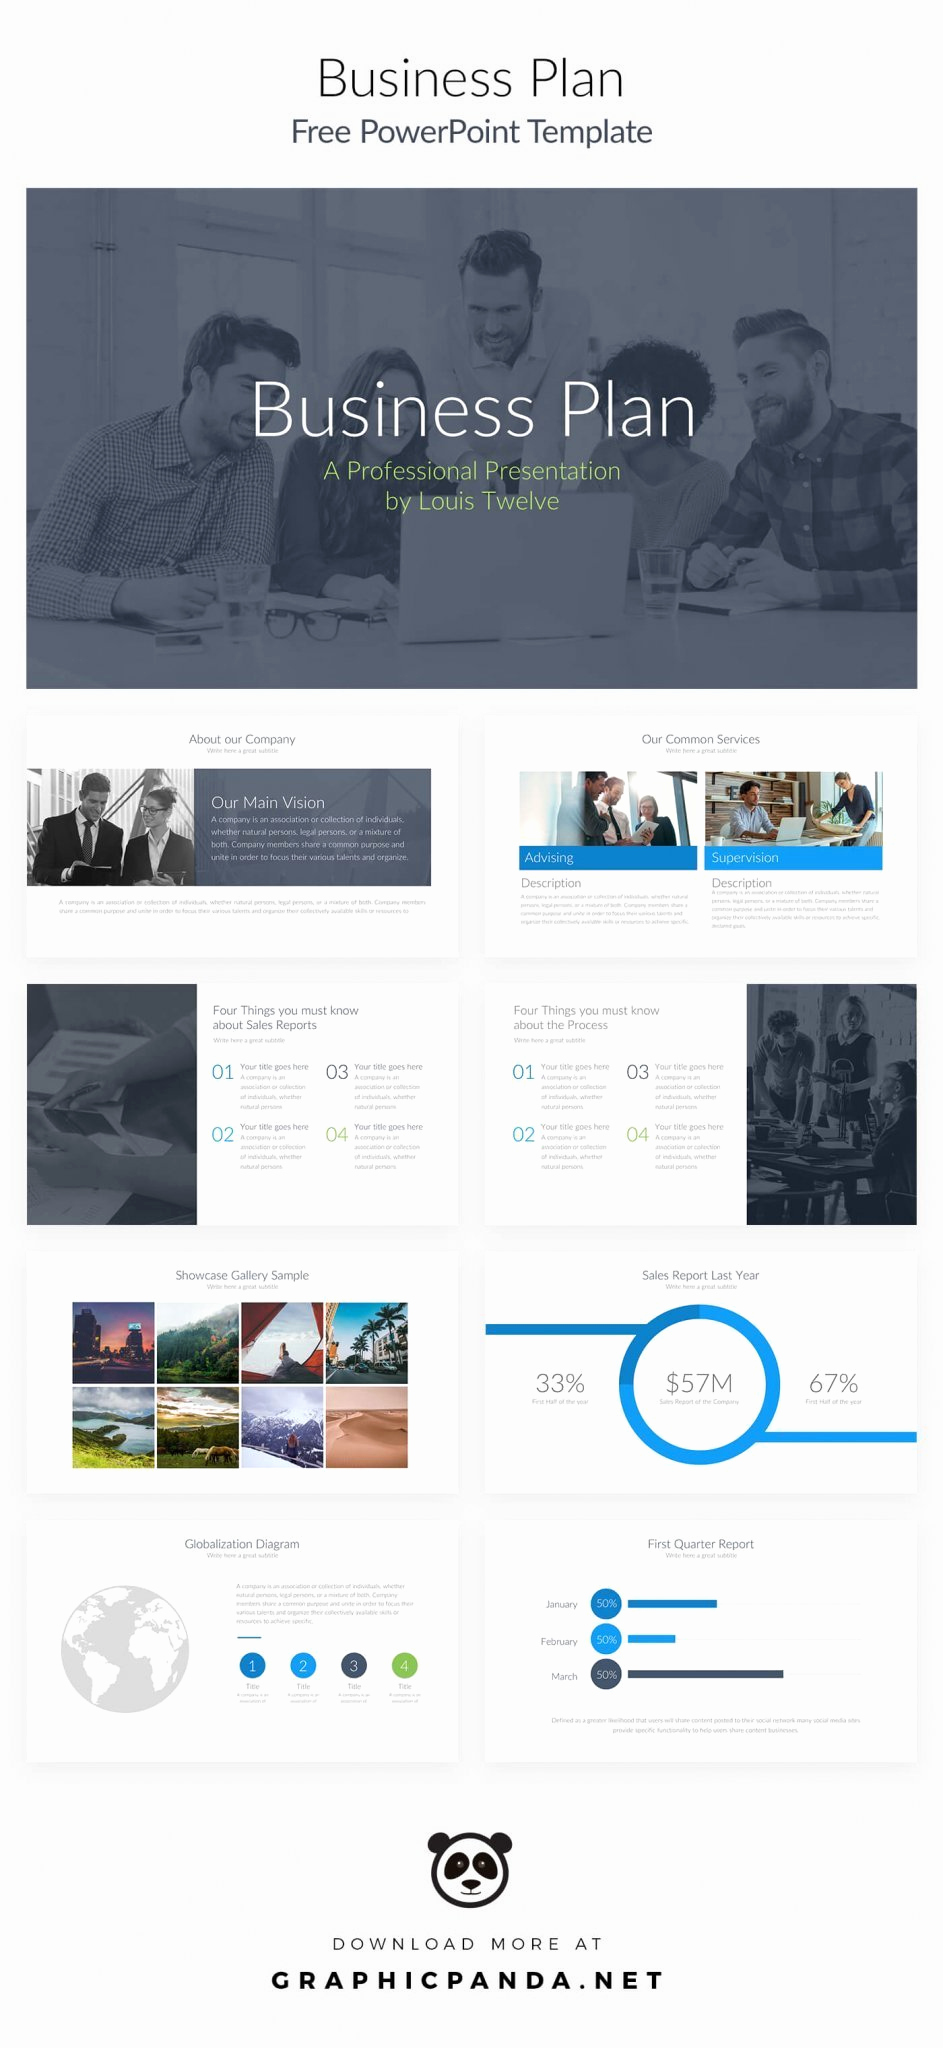 Business Plan Template Powerpoint Unique Free Business Plan Powerpoint Presentation Template